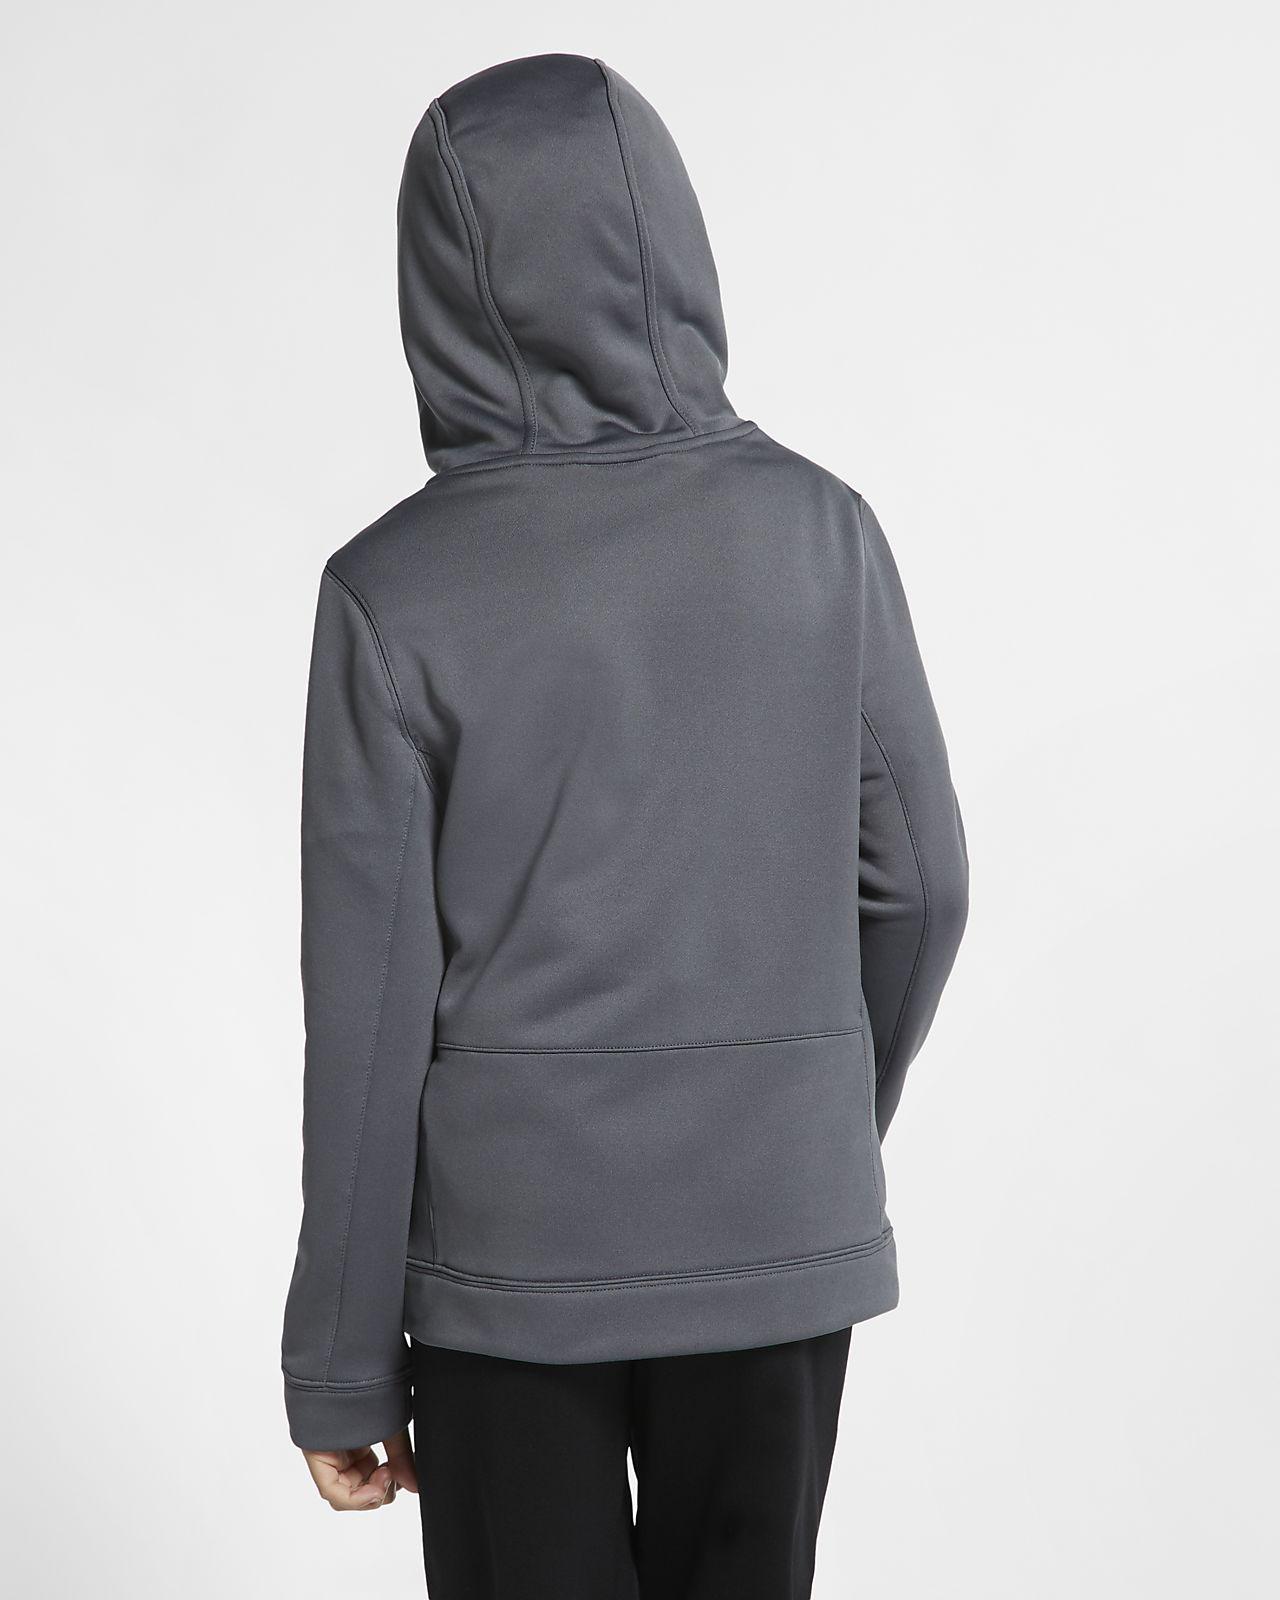 a6b38e6a4a1 Φόρμα Nike Sportswear Advance 15 για μεγάλα αγόρια. Nike.com GR